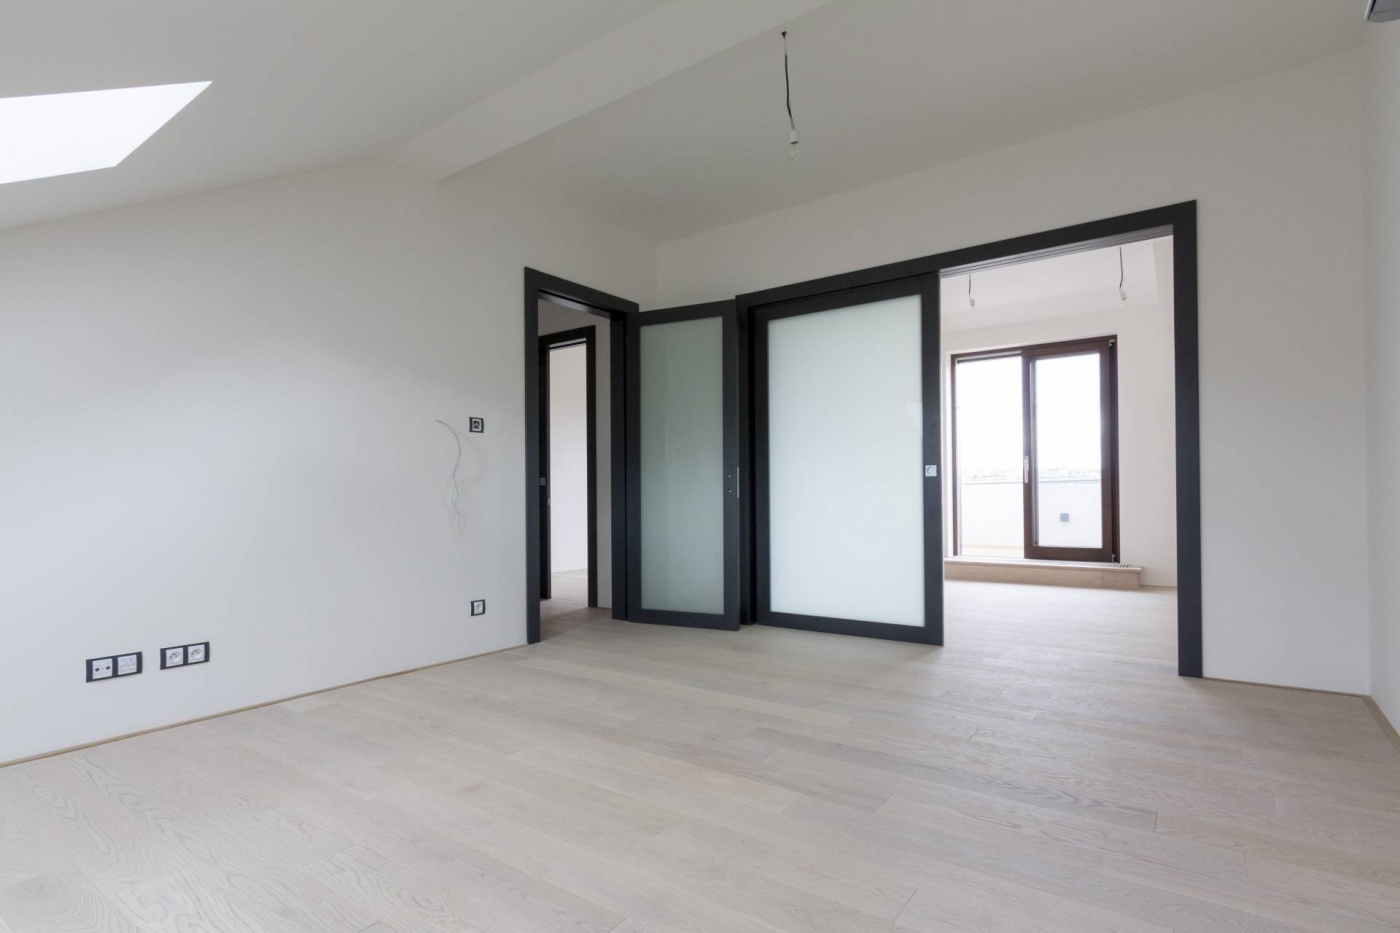 Půdní byt 3+1, plocha 98 m², ulice Lumírova, Praha 2 - Vyšehrad   2